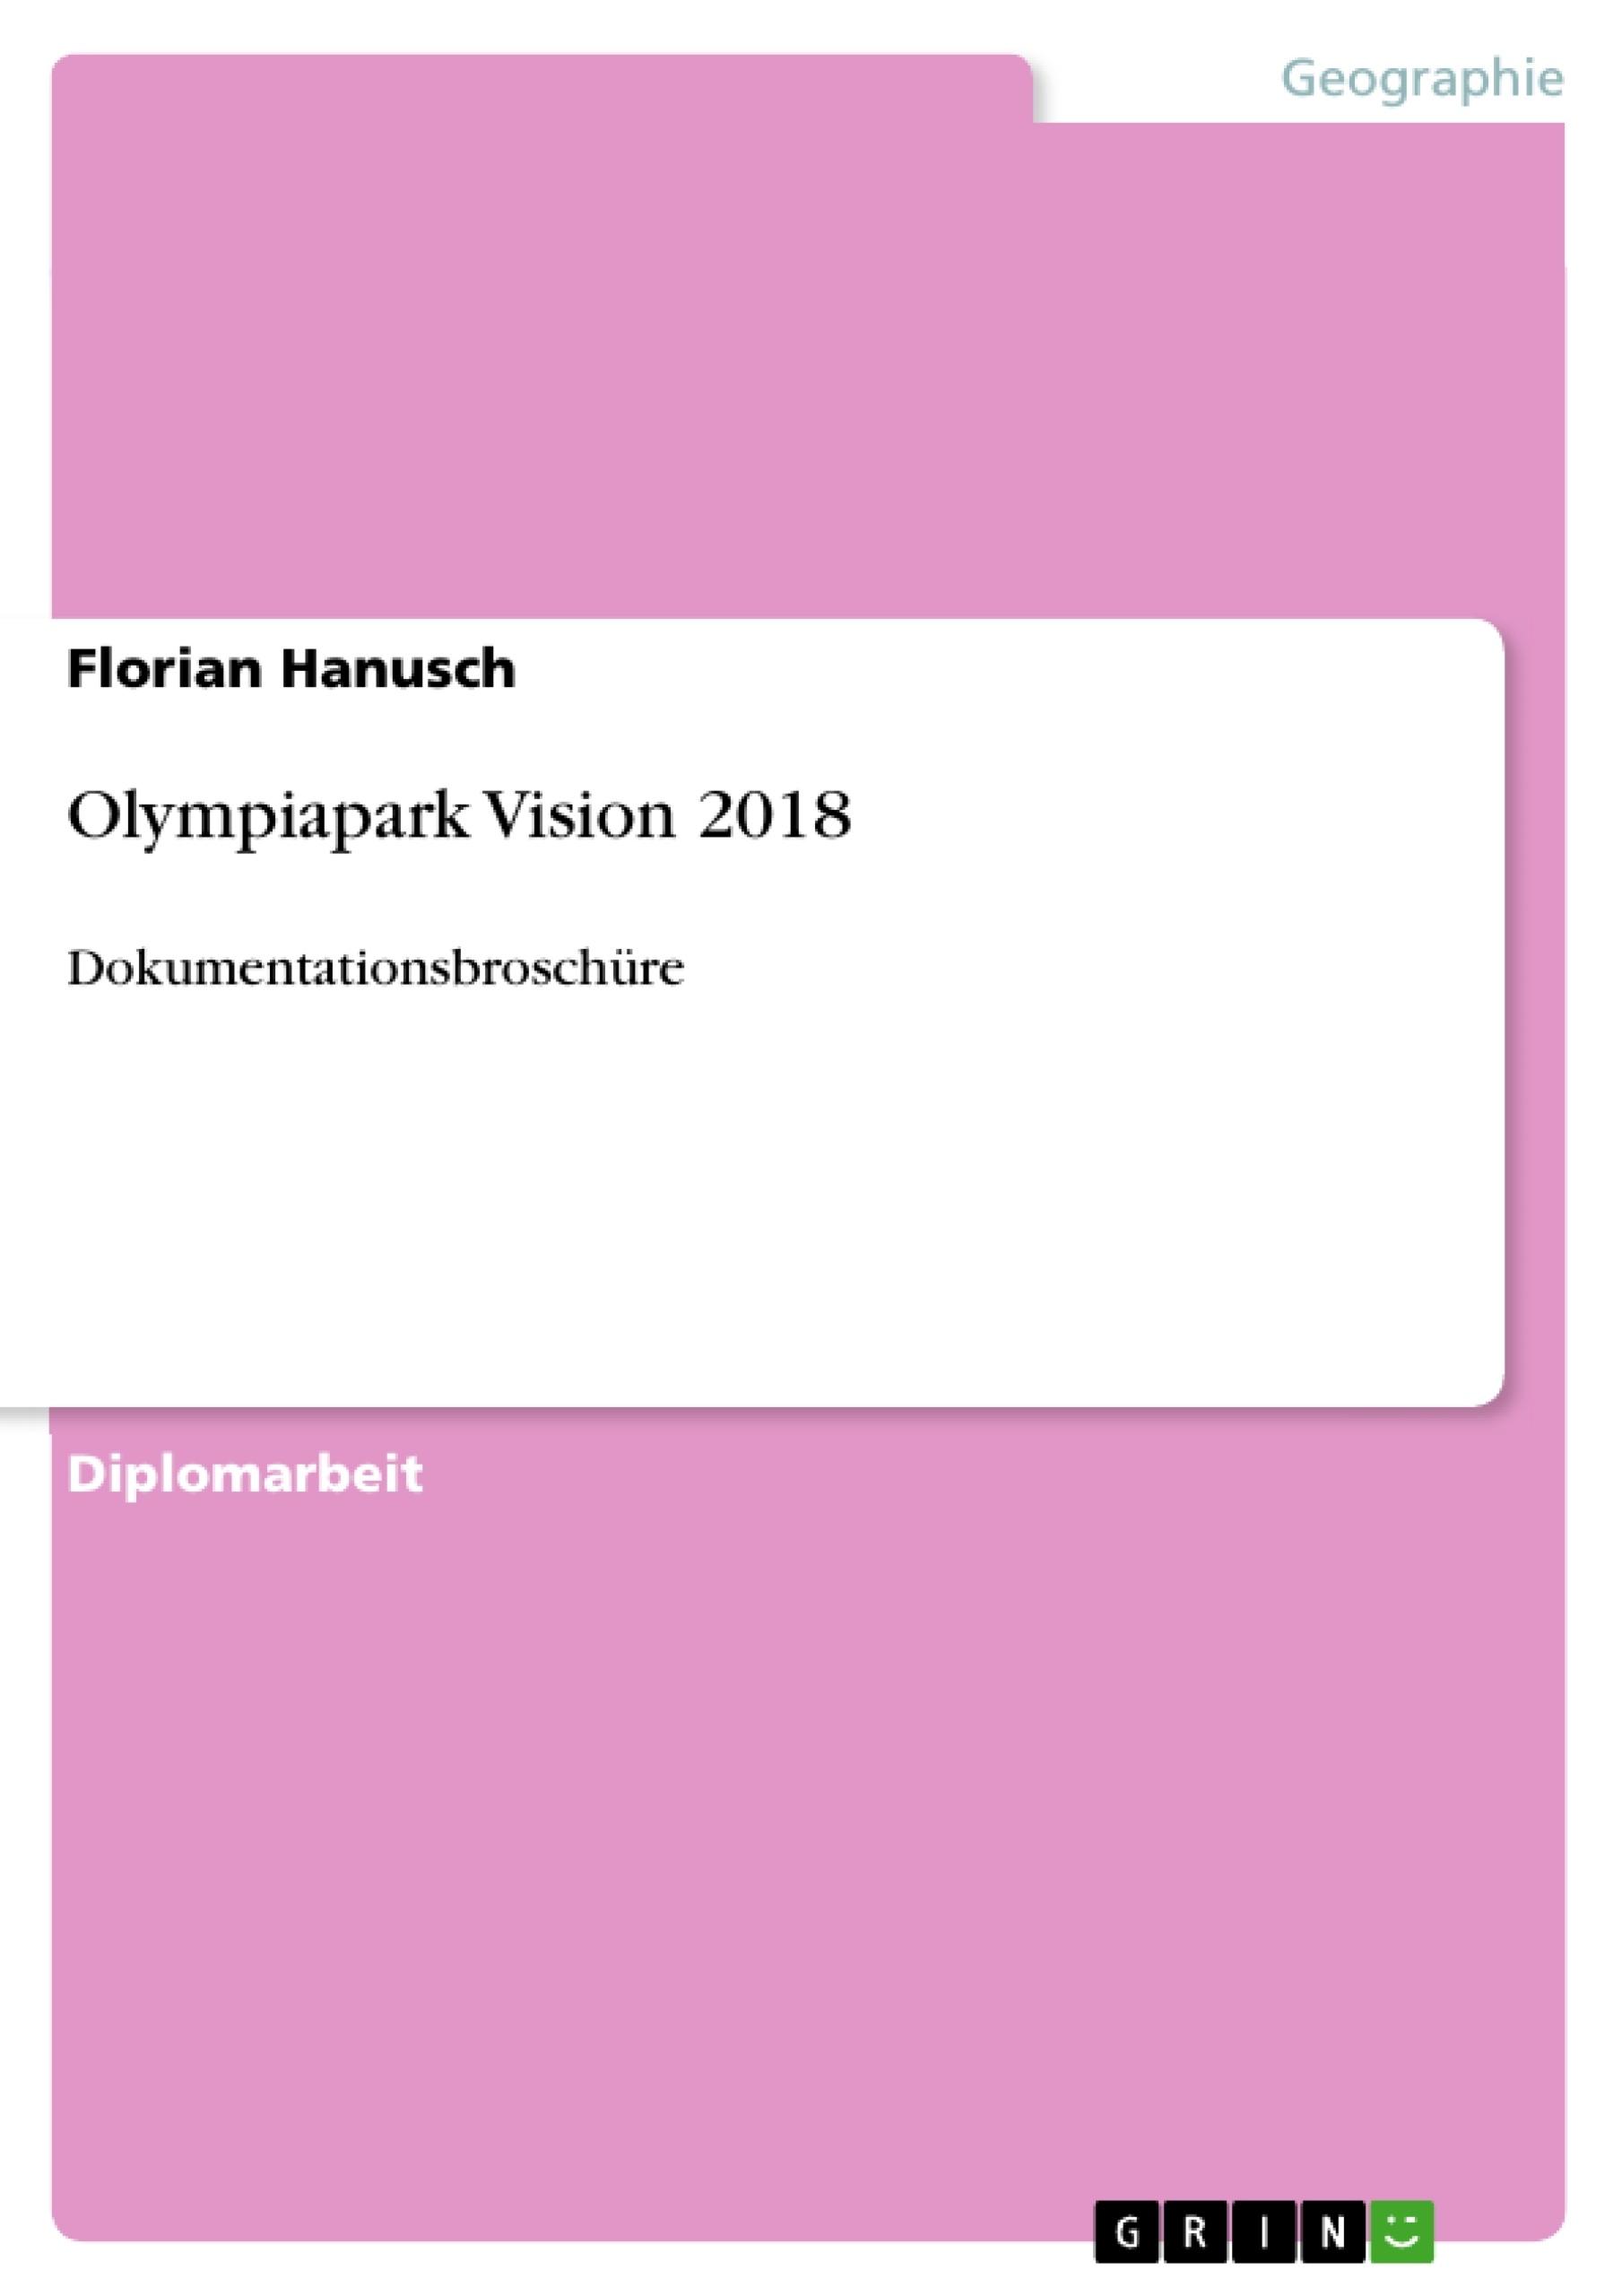 Titel: Olympiapark Vision 2018